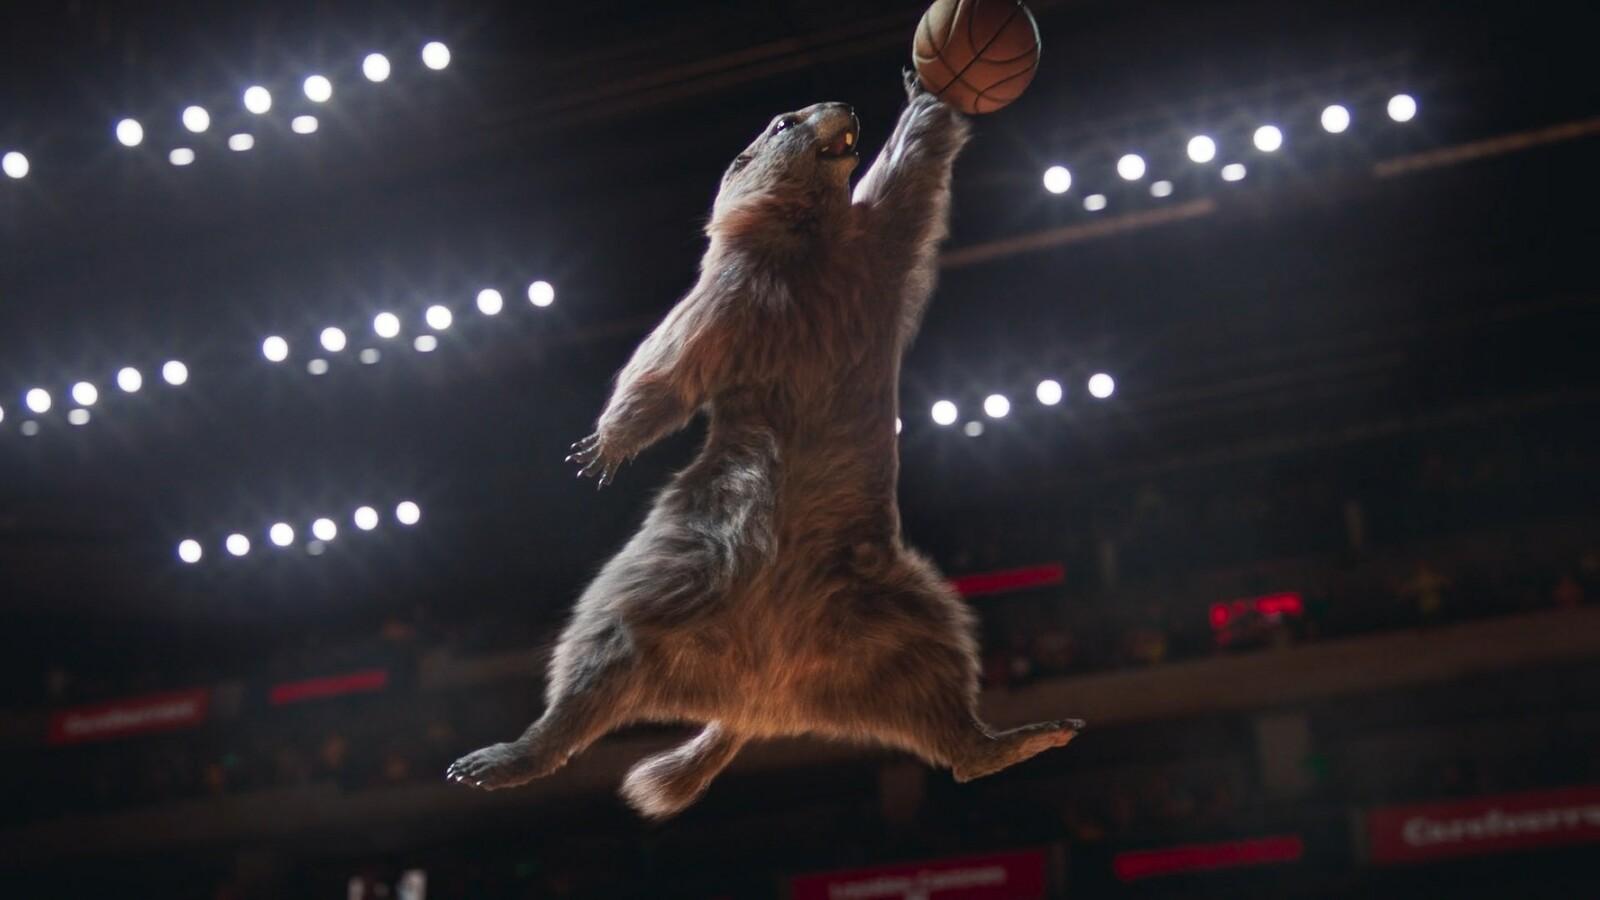 Les marmottes - France 3